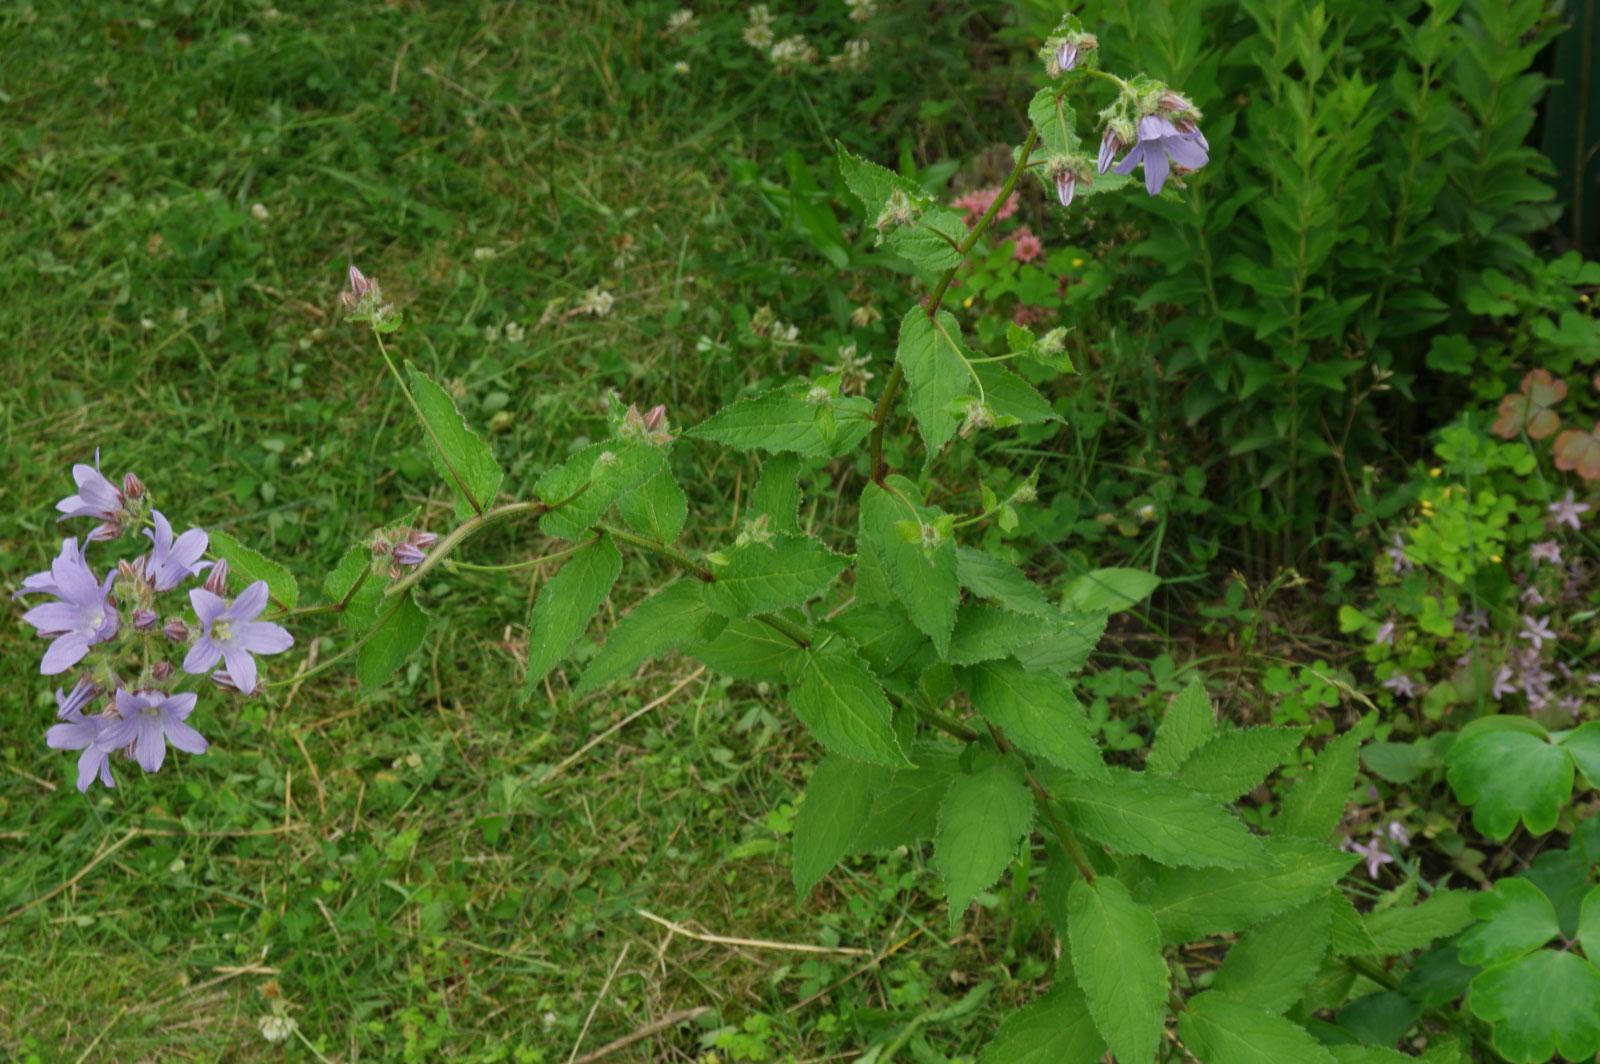 Campanula lactiflora Prichards Variety